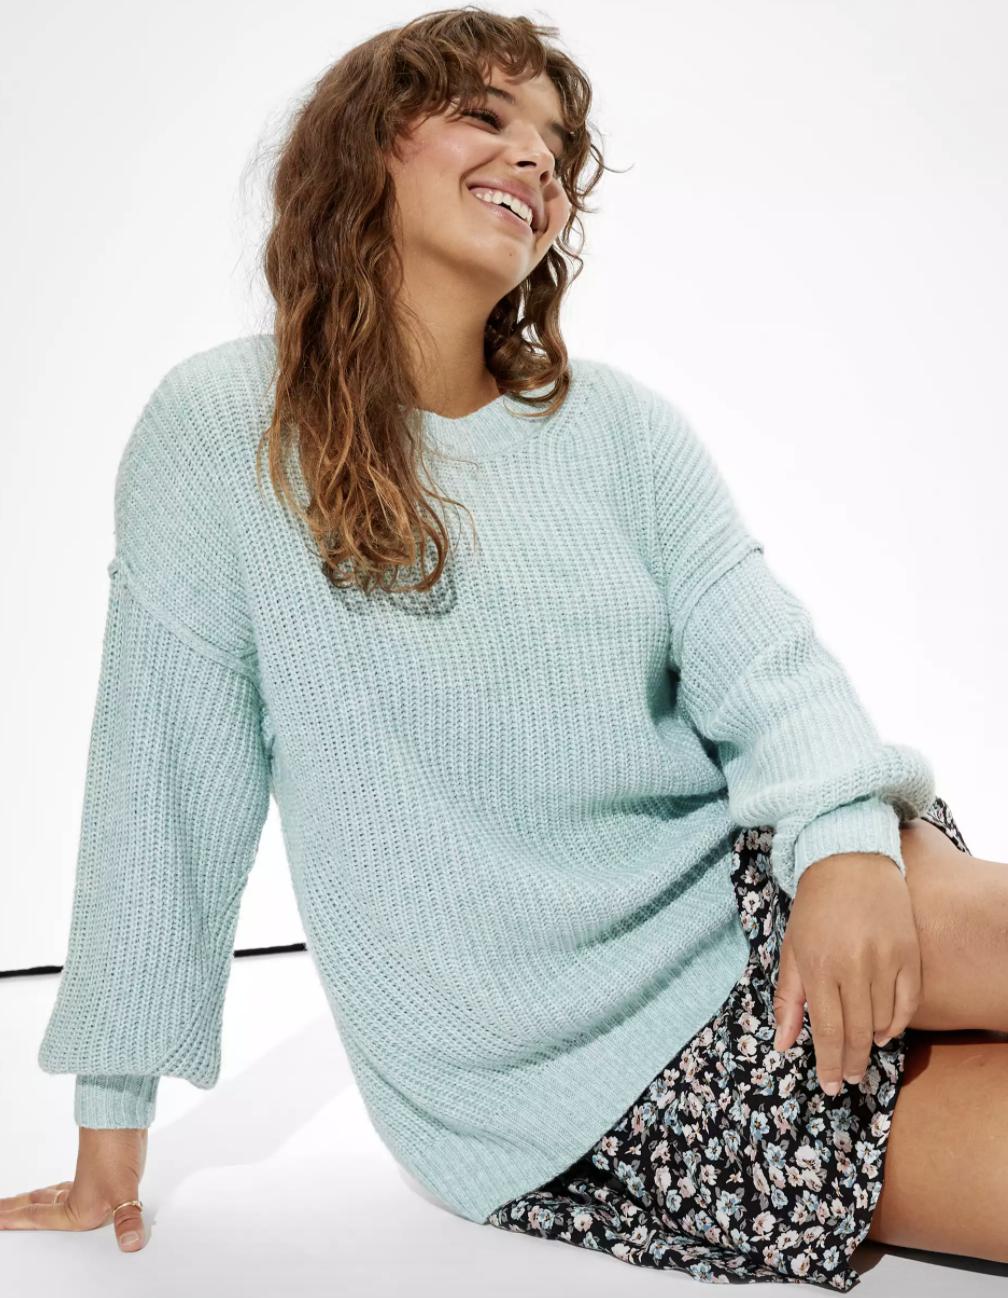 a model in an oversized light blue sweater